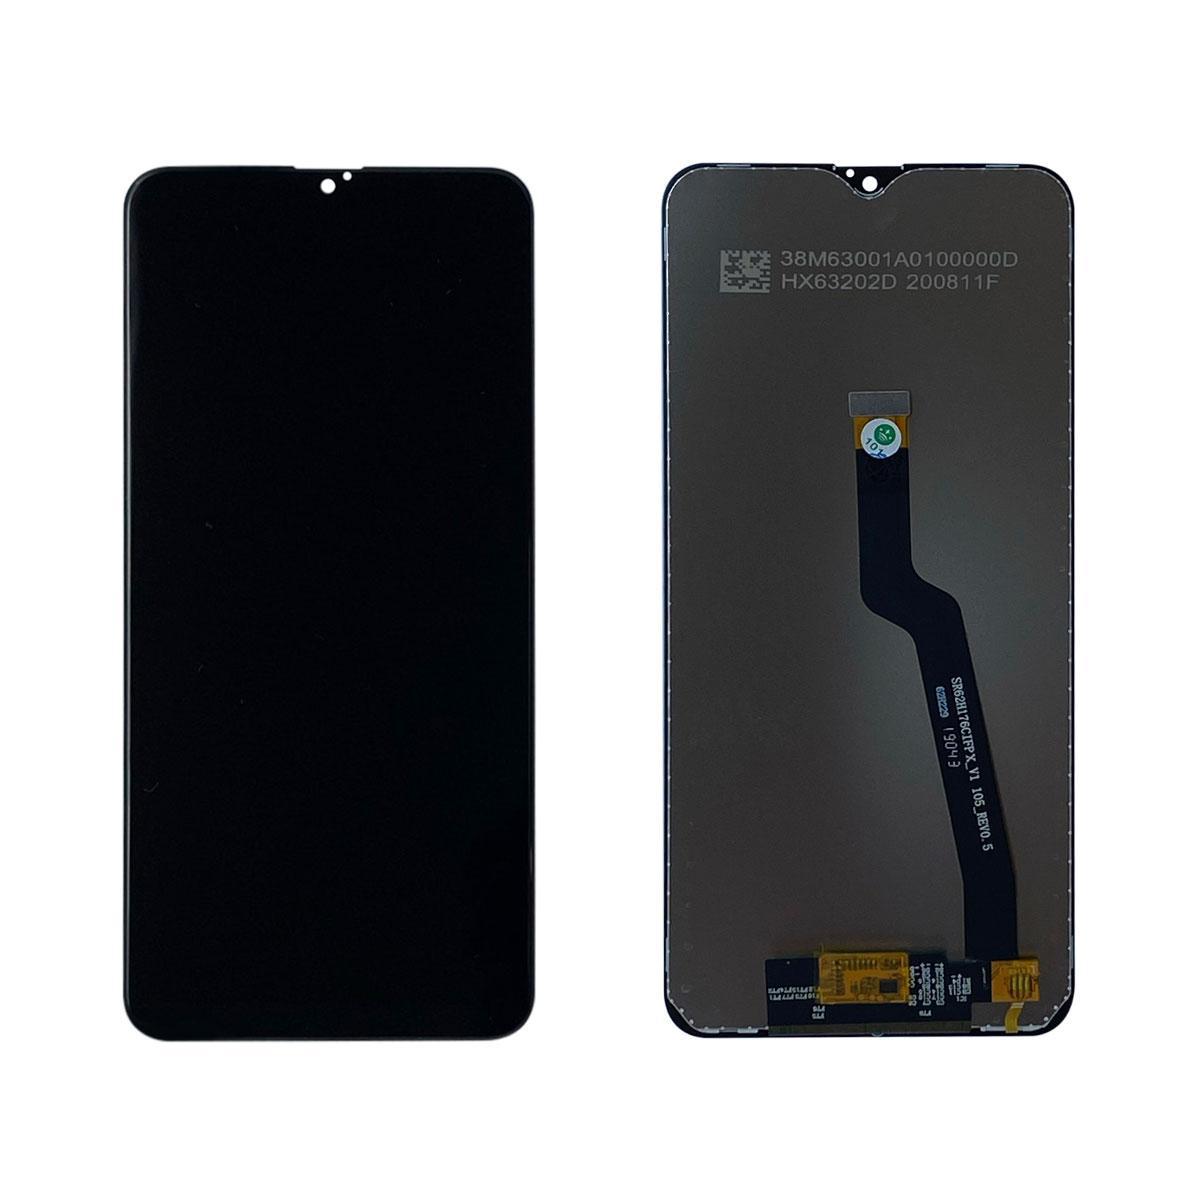 Tela Display Frontal Lcd Compatível A10 Empório Premium